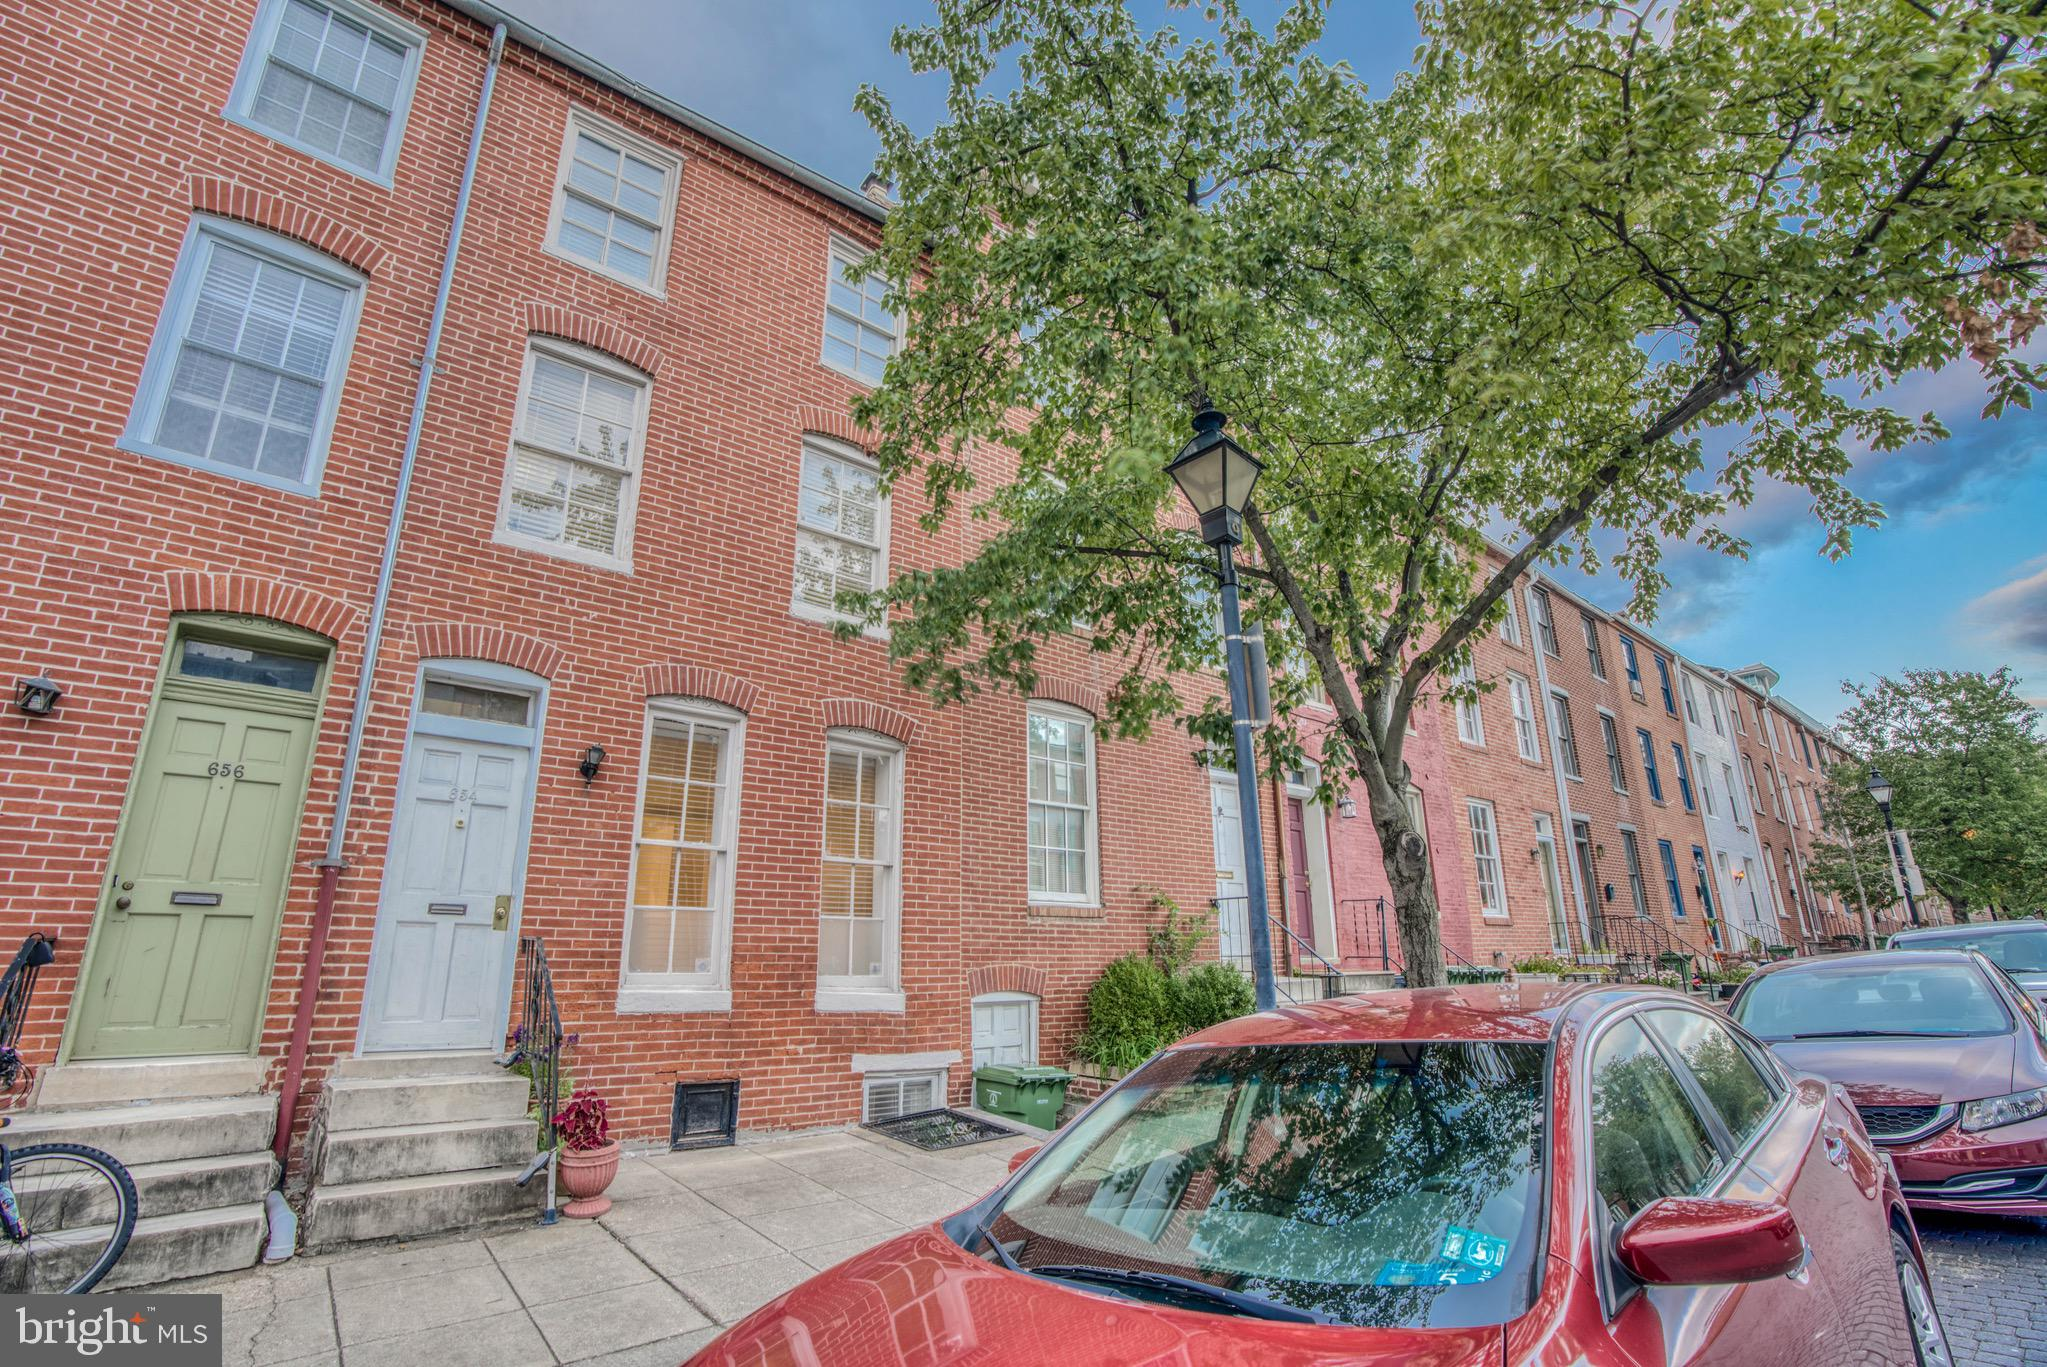 654 Portland St, Baltimore, MD, 21230